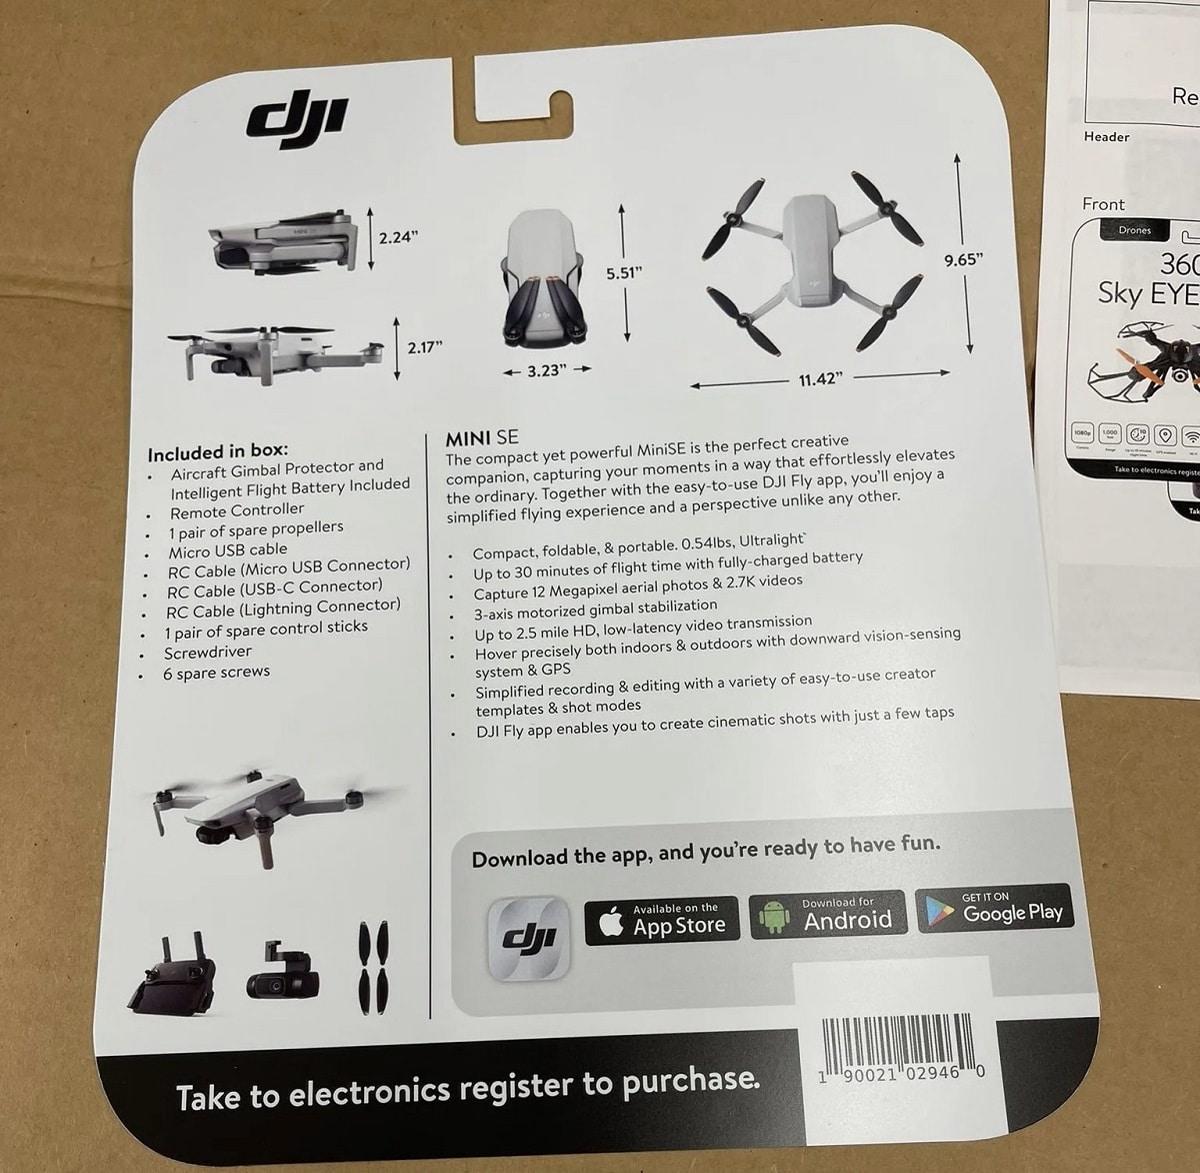 Packaging DJI Mini SE